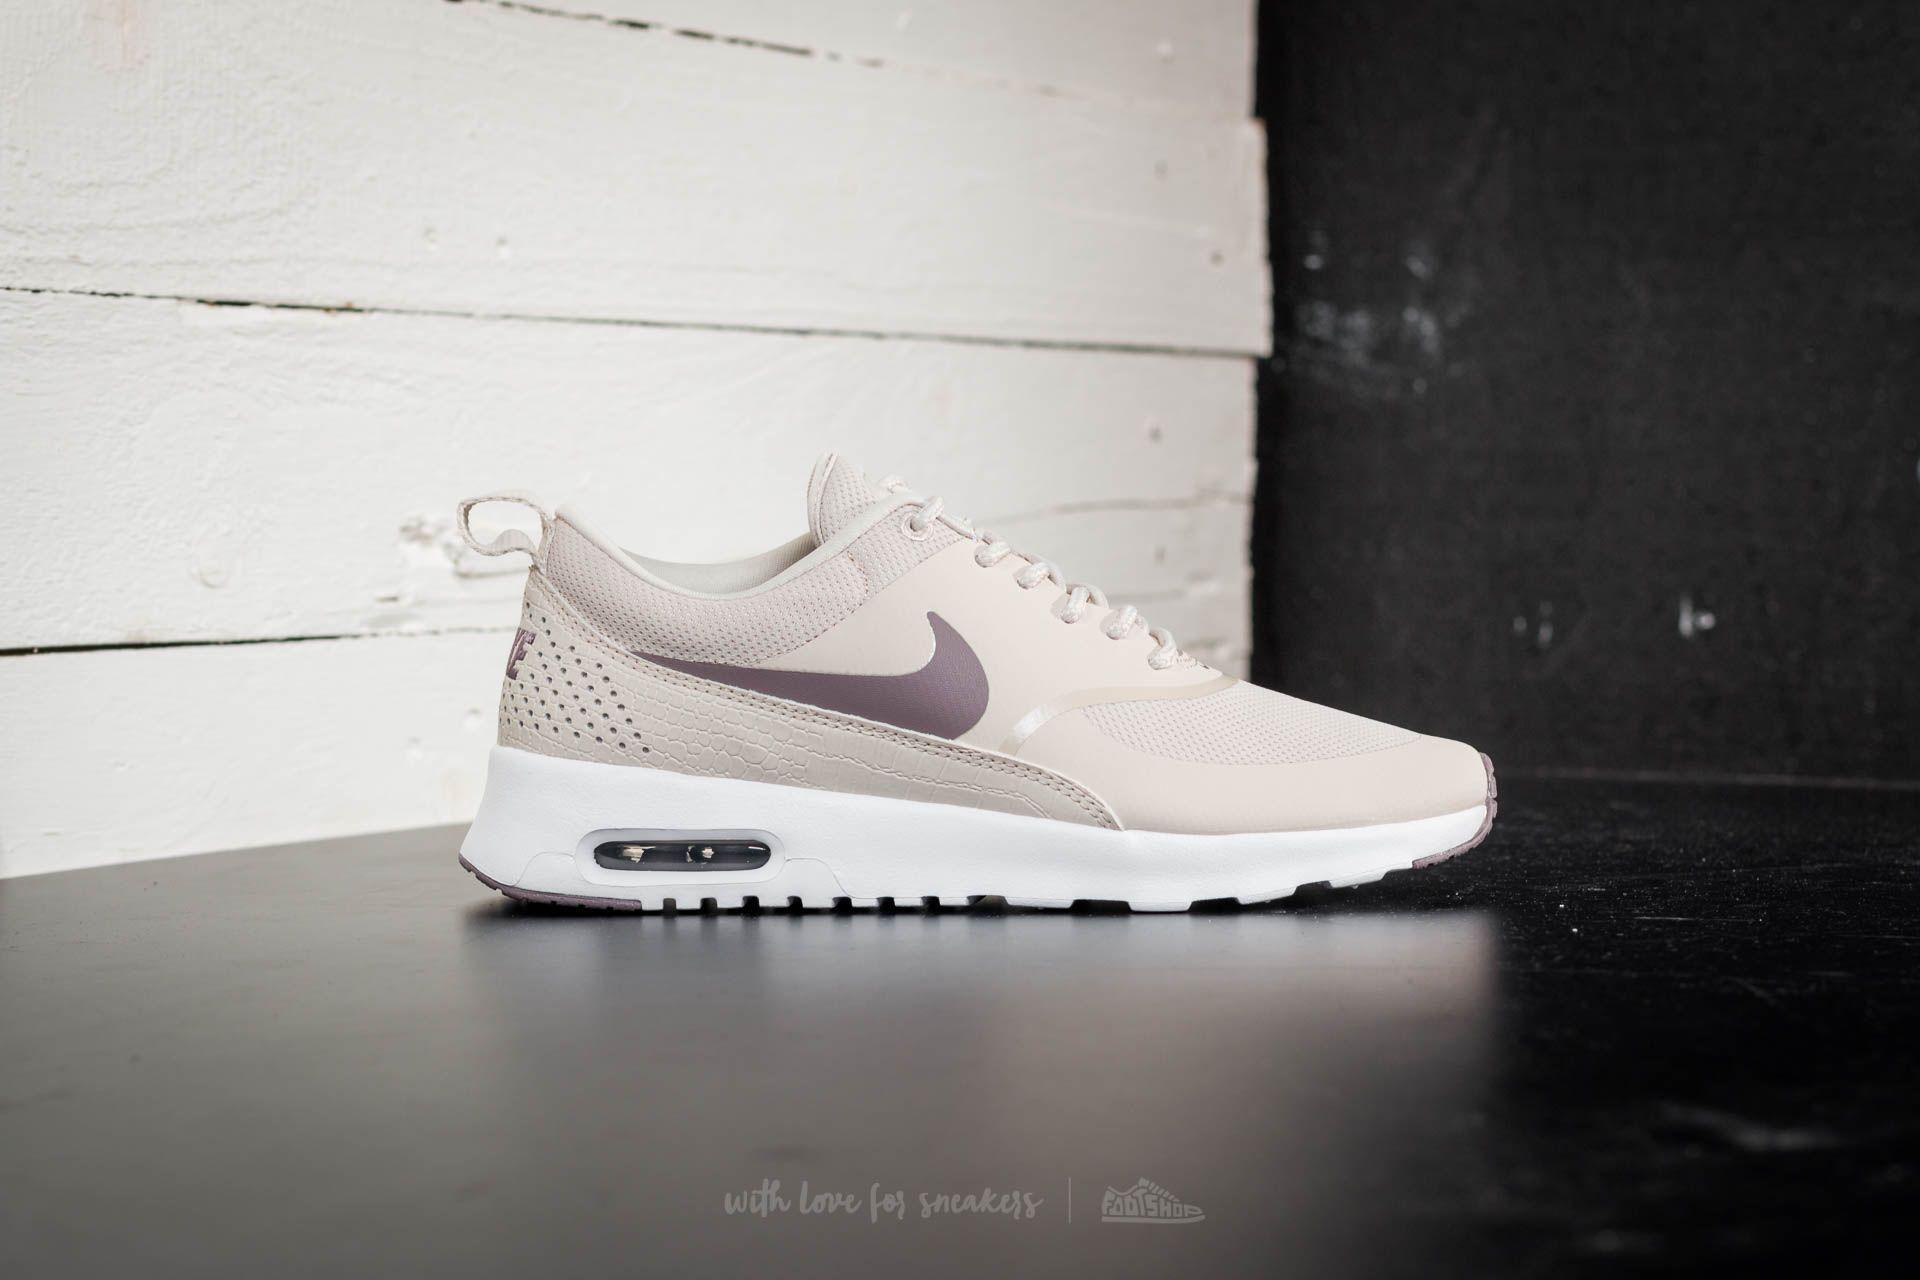 nike grey and brown sneakers